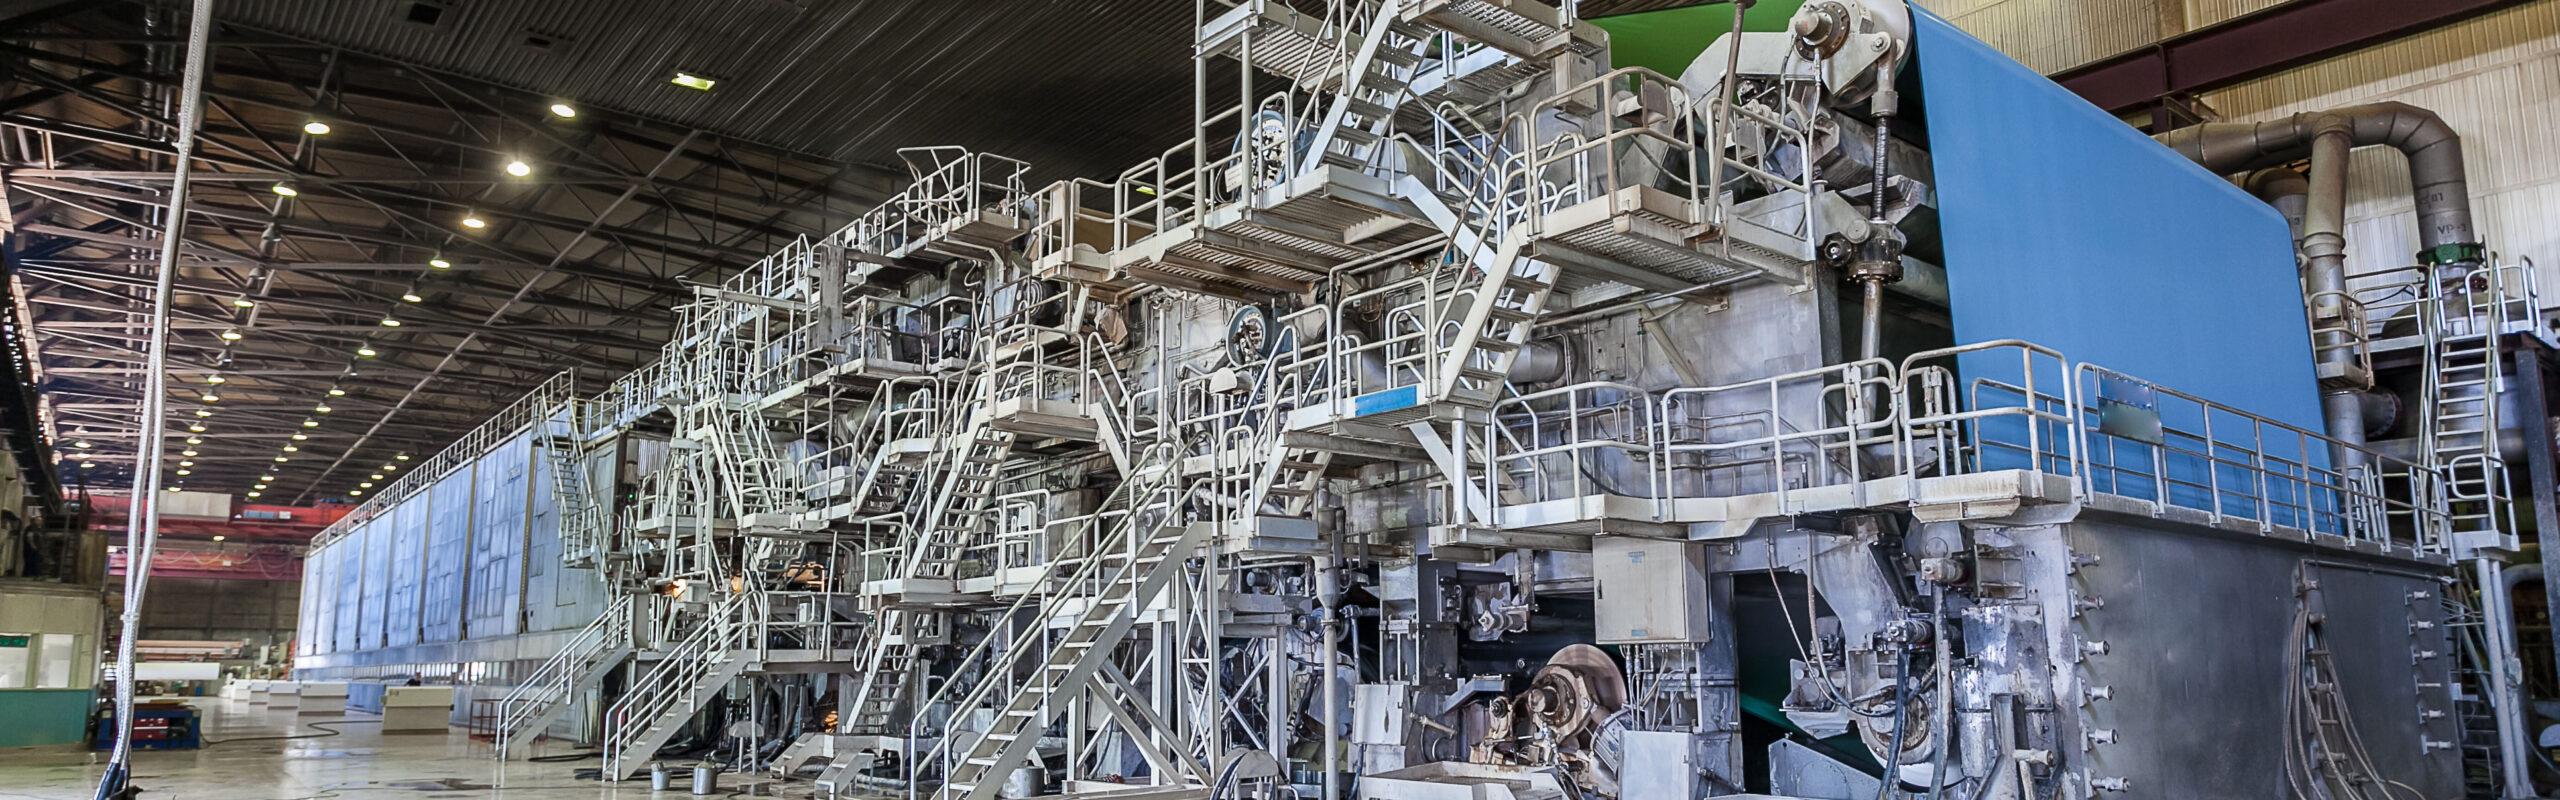 A paper machine in a processing facility